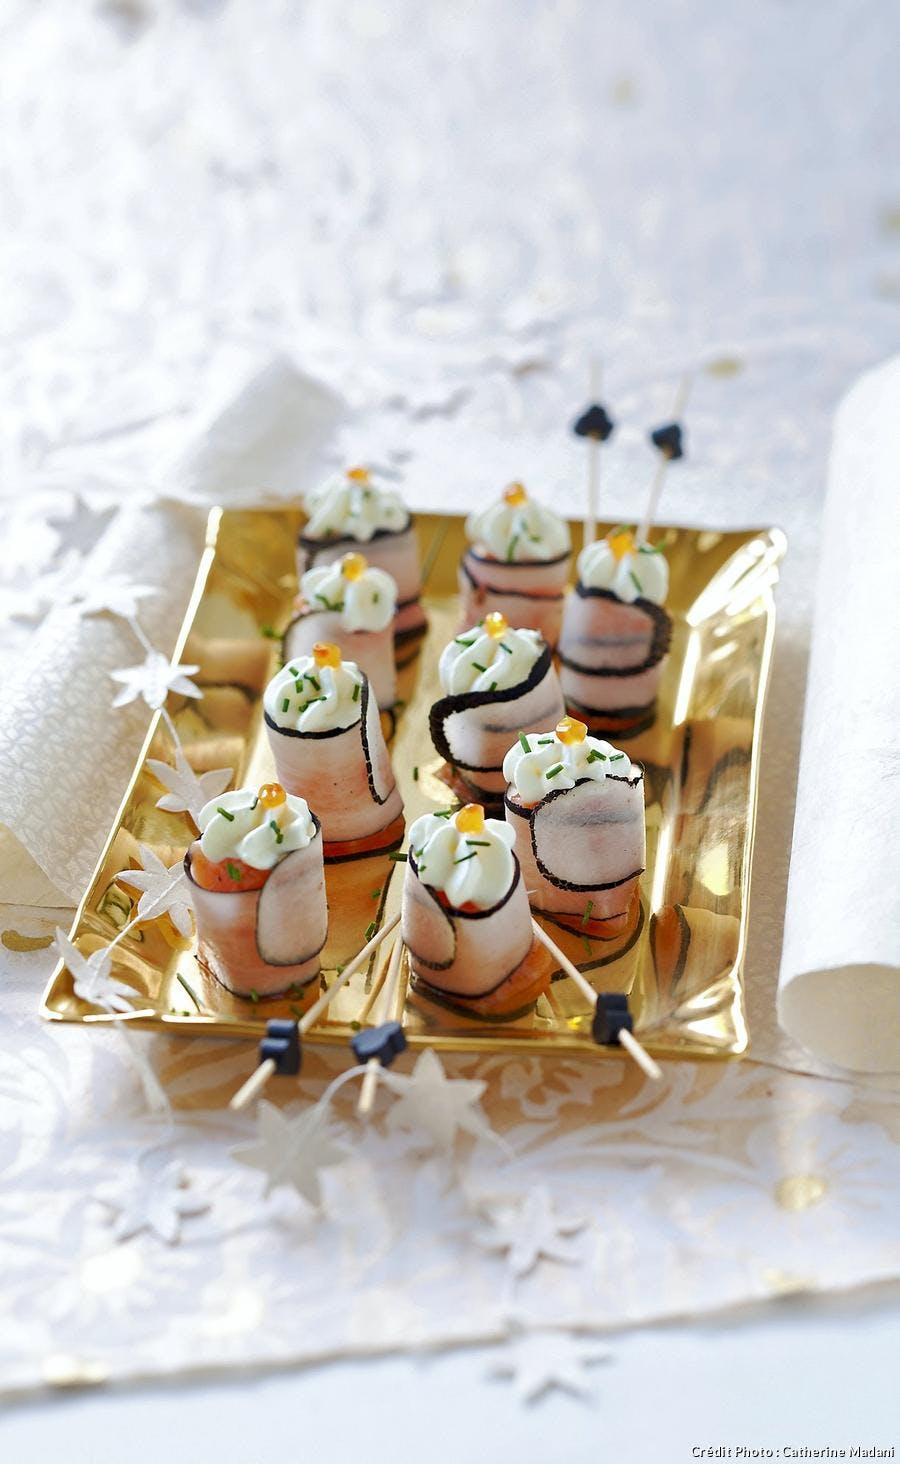 r62-bouchee-saumon-radis_cma.jpg